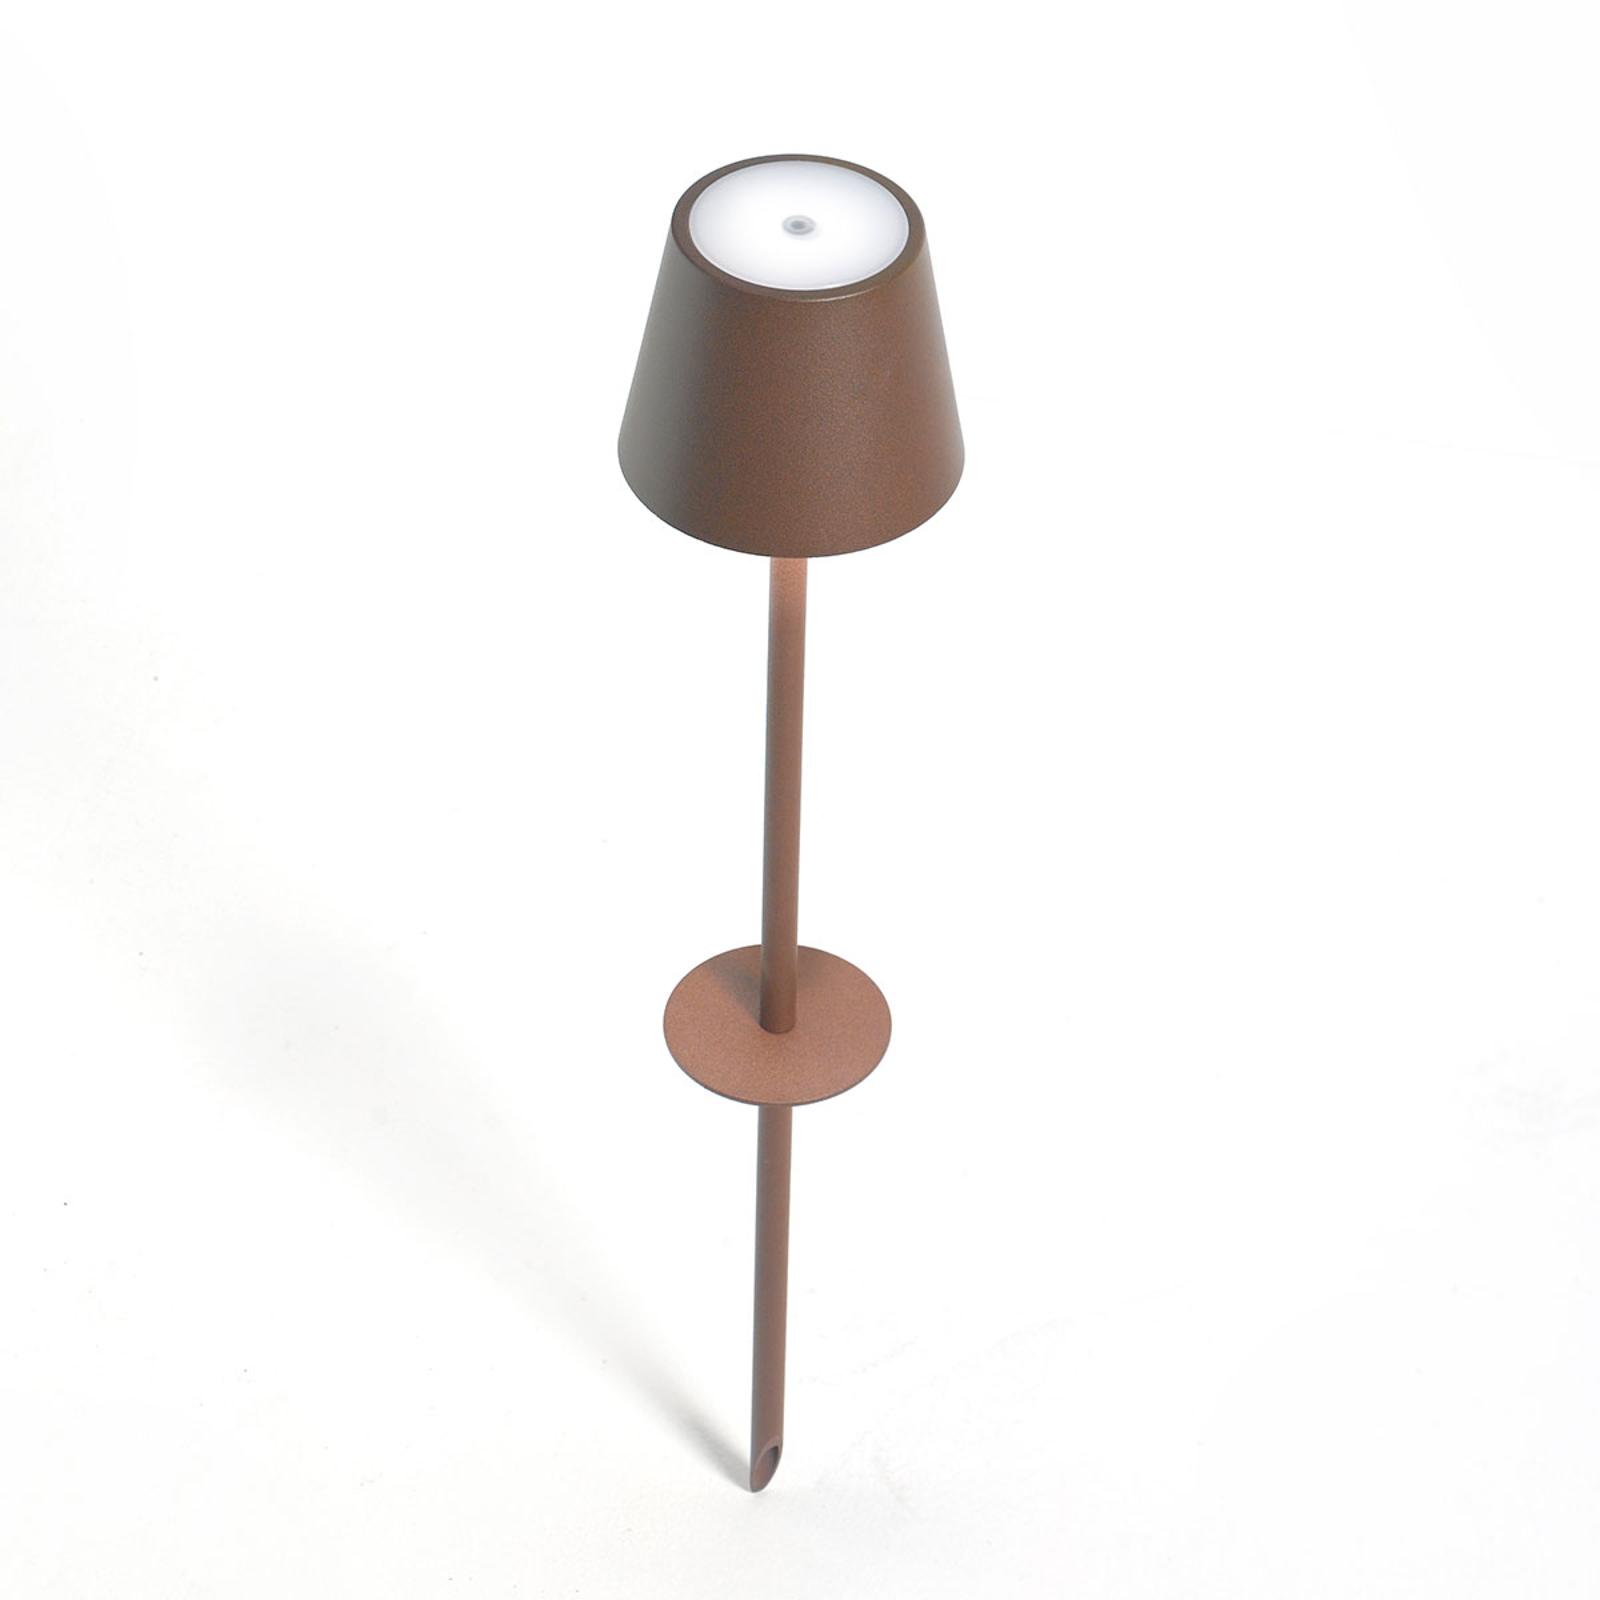 LED-Erdspießleuchte Poldina mit Akku, braun, 85 cm